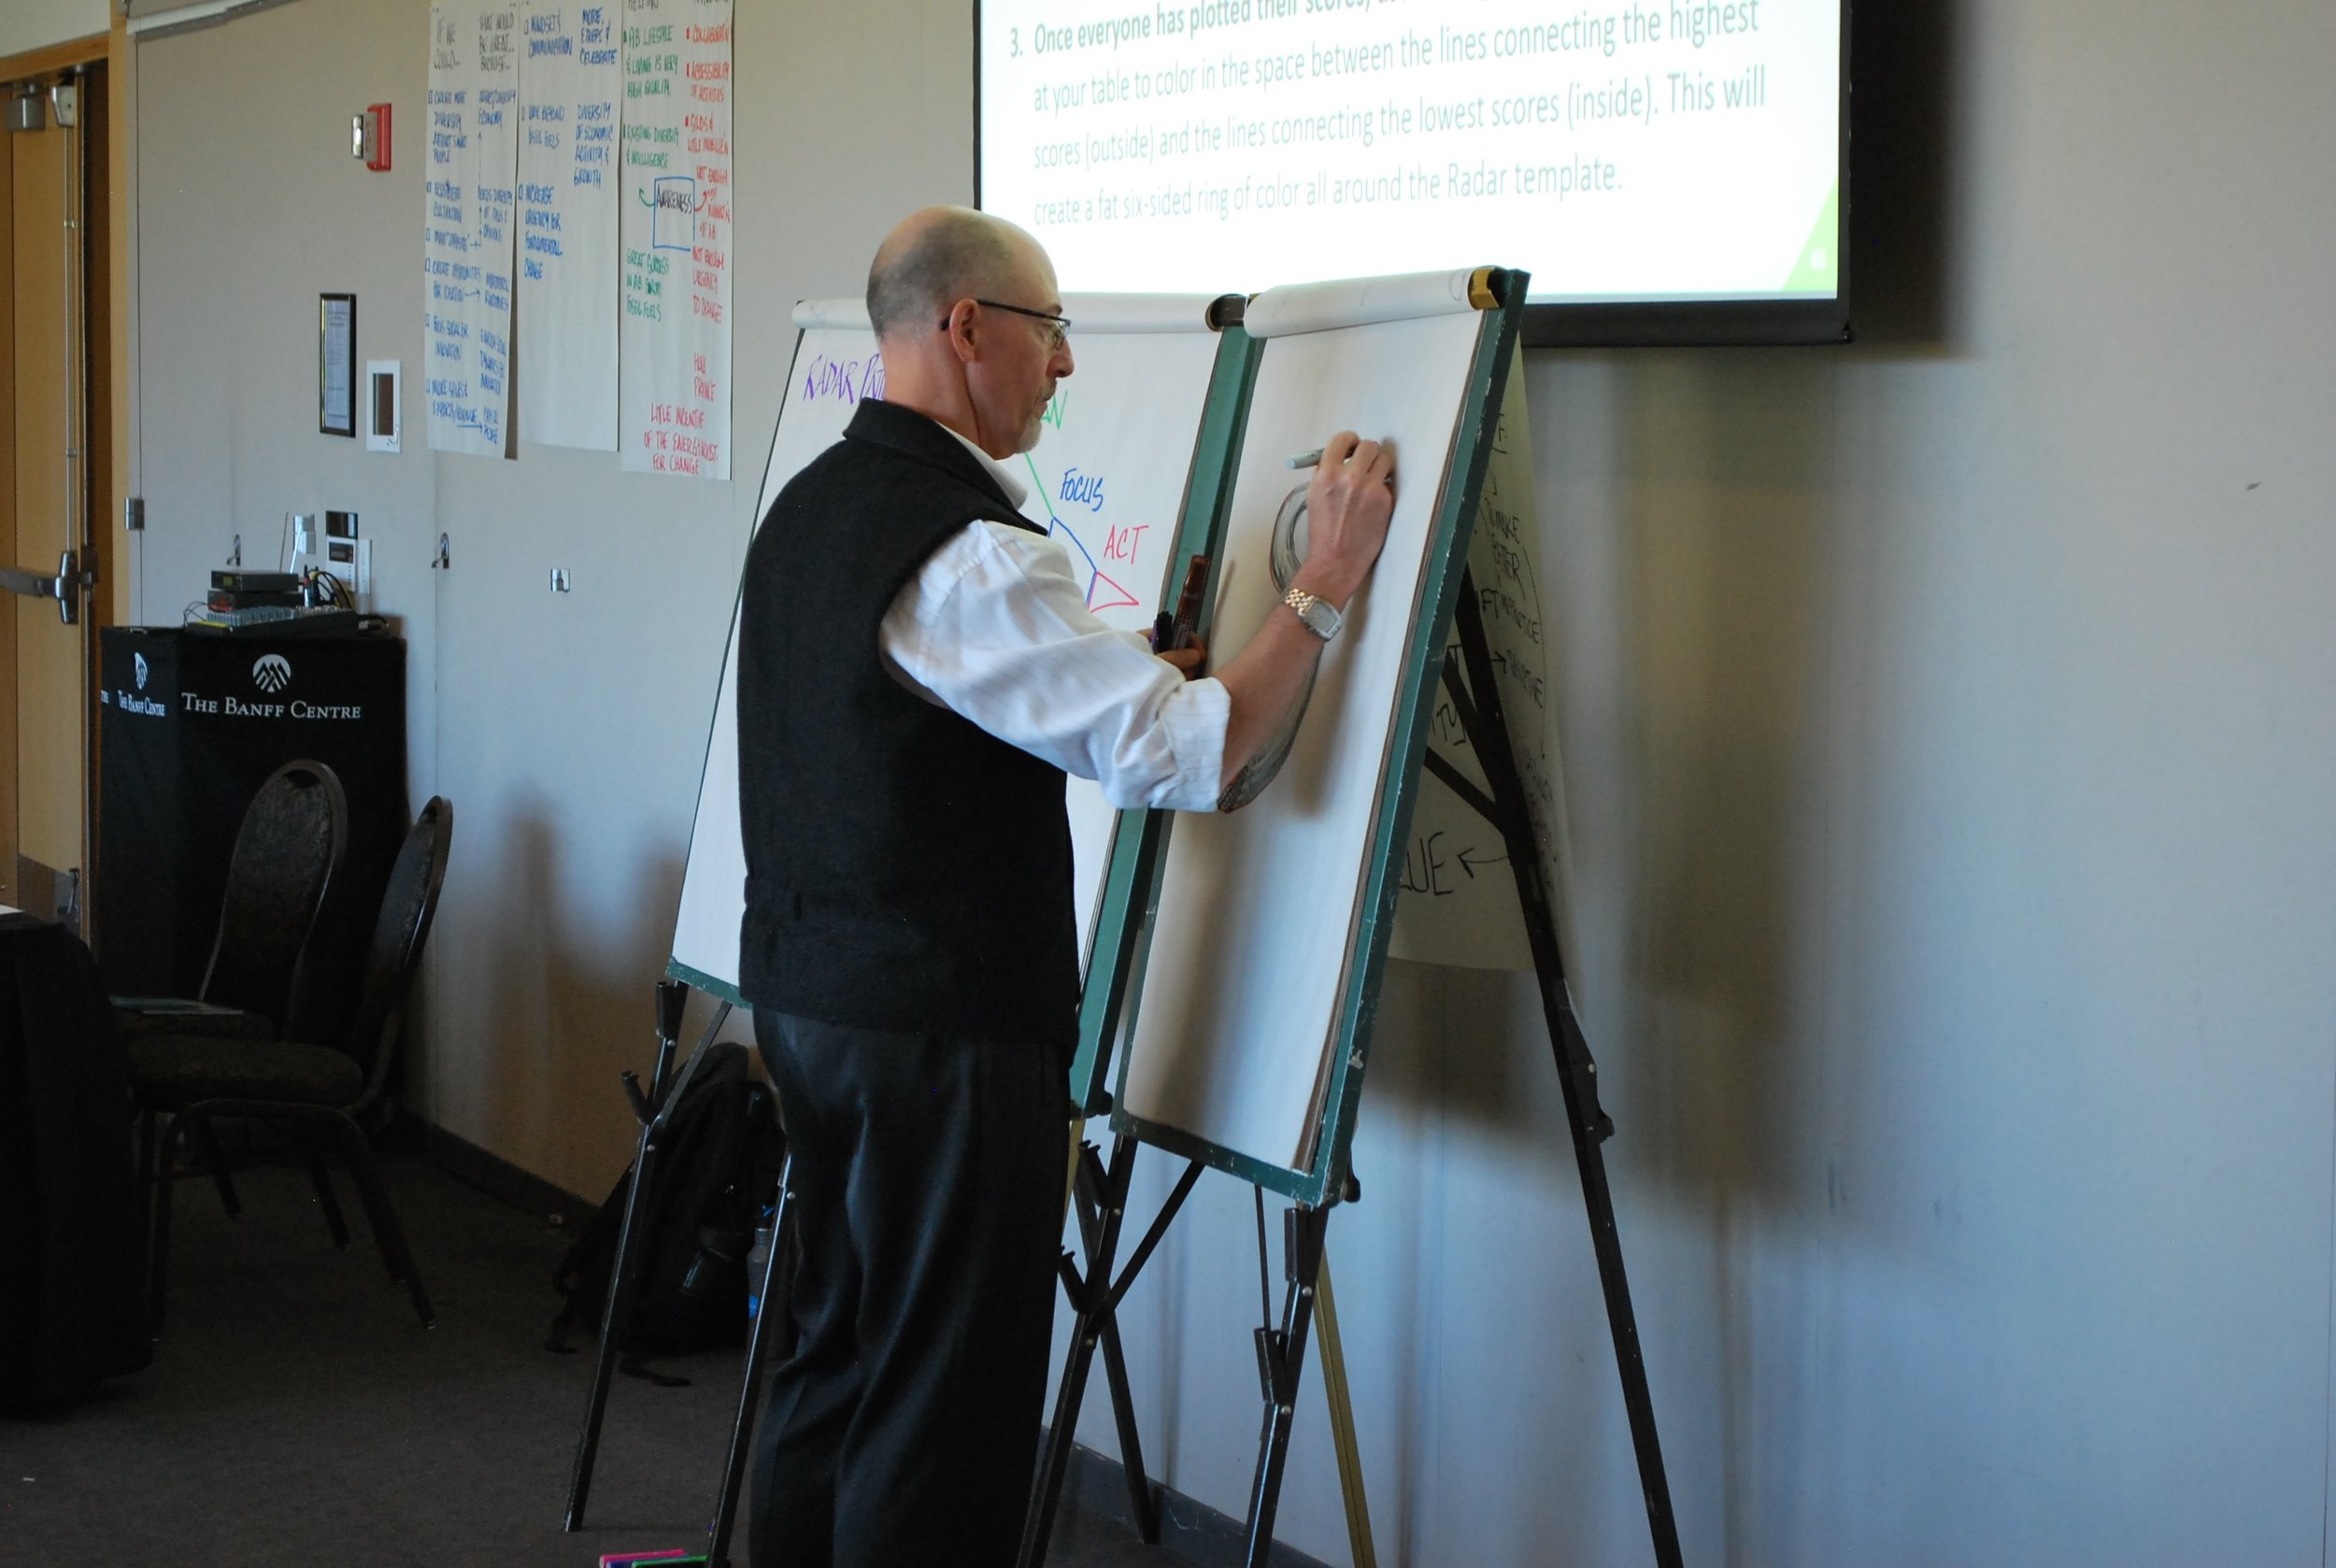 Joe Sterling, Partner at Rainforest Strategies, LLP